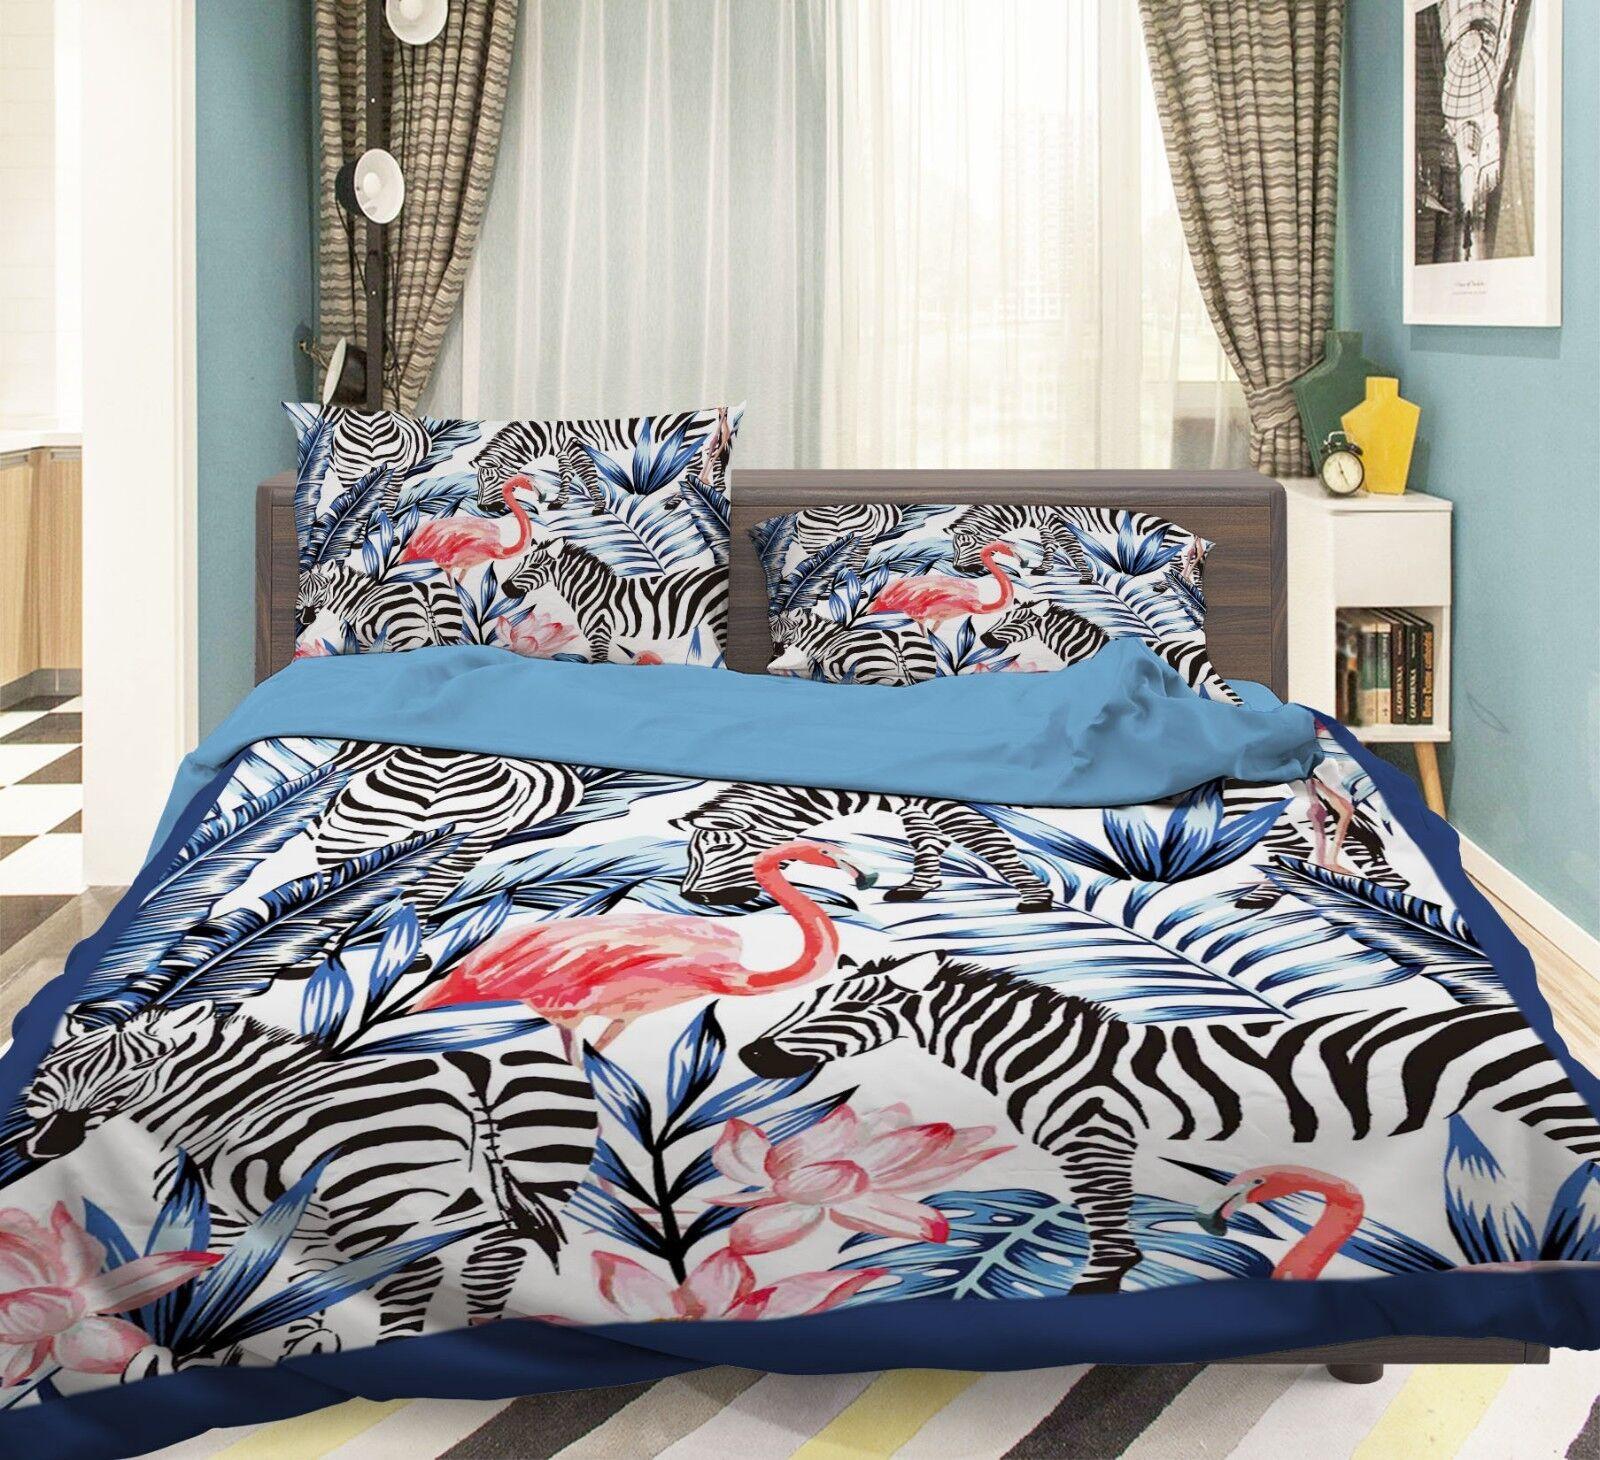 3D Zebra Leaves 678 Bed Pillowcases Quilt Duvet Cover Set Single Queen AU Carly